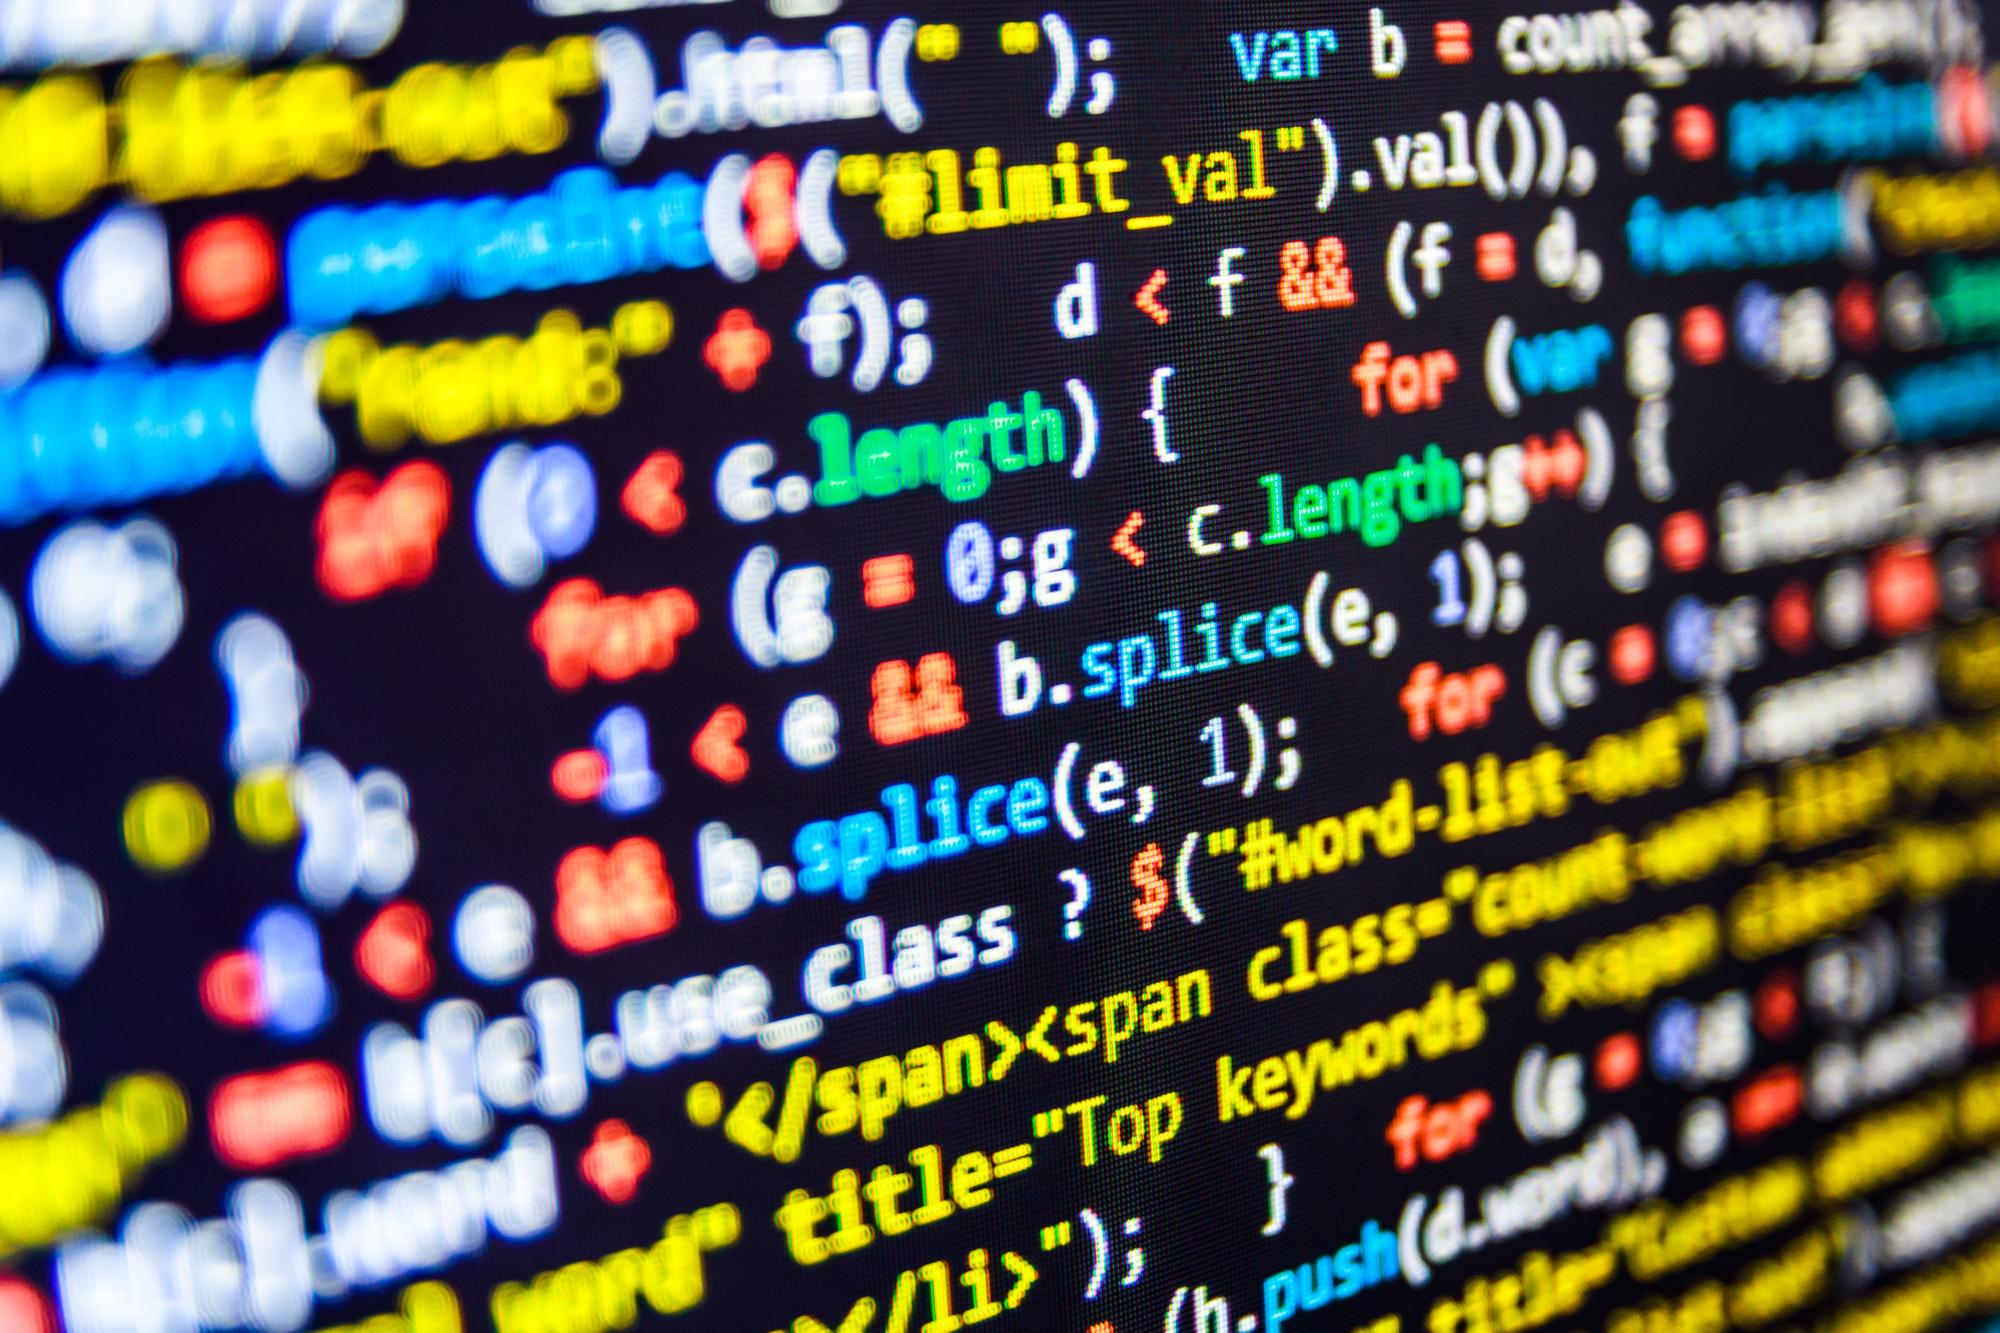 New Va High School To Focus Big On Coding